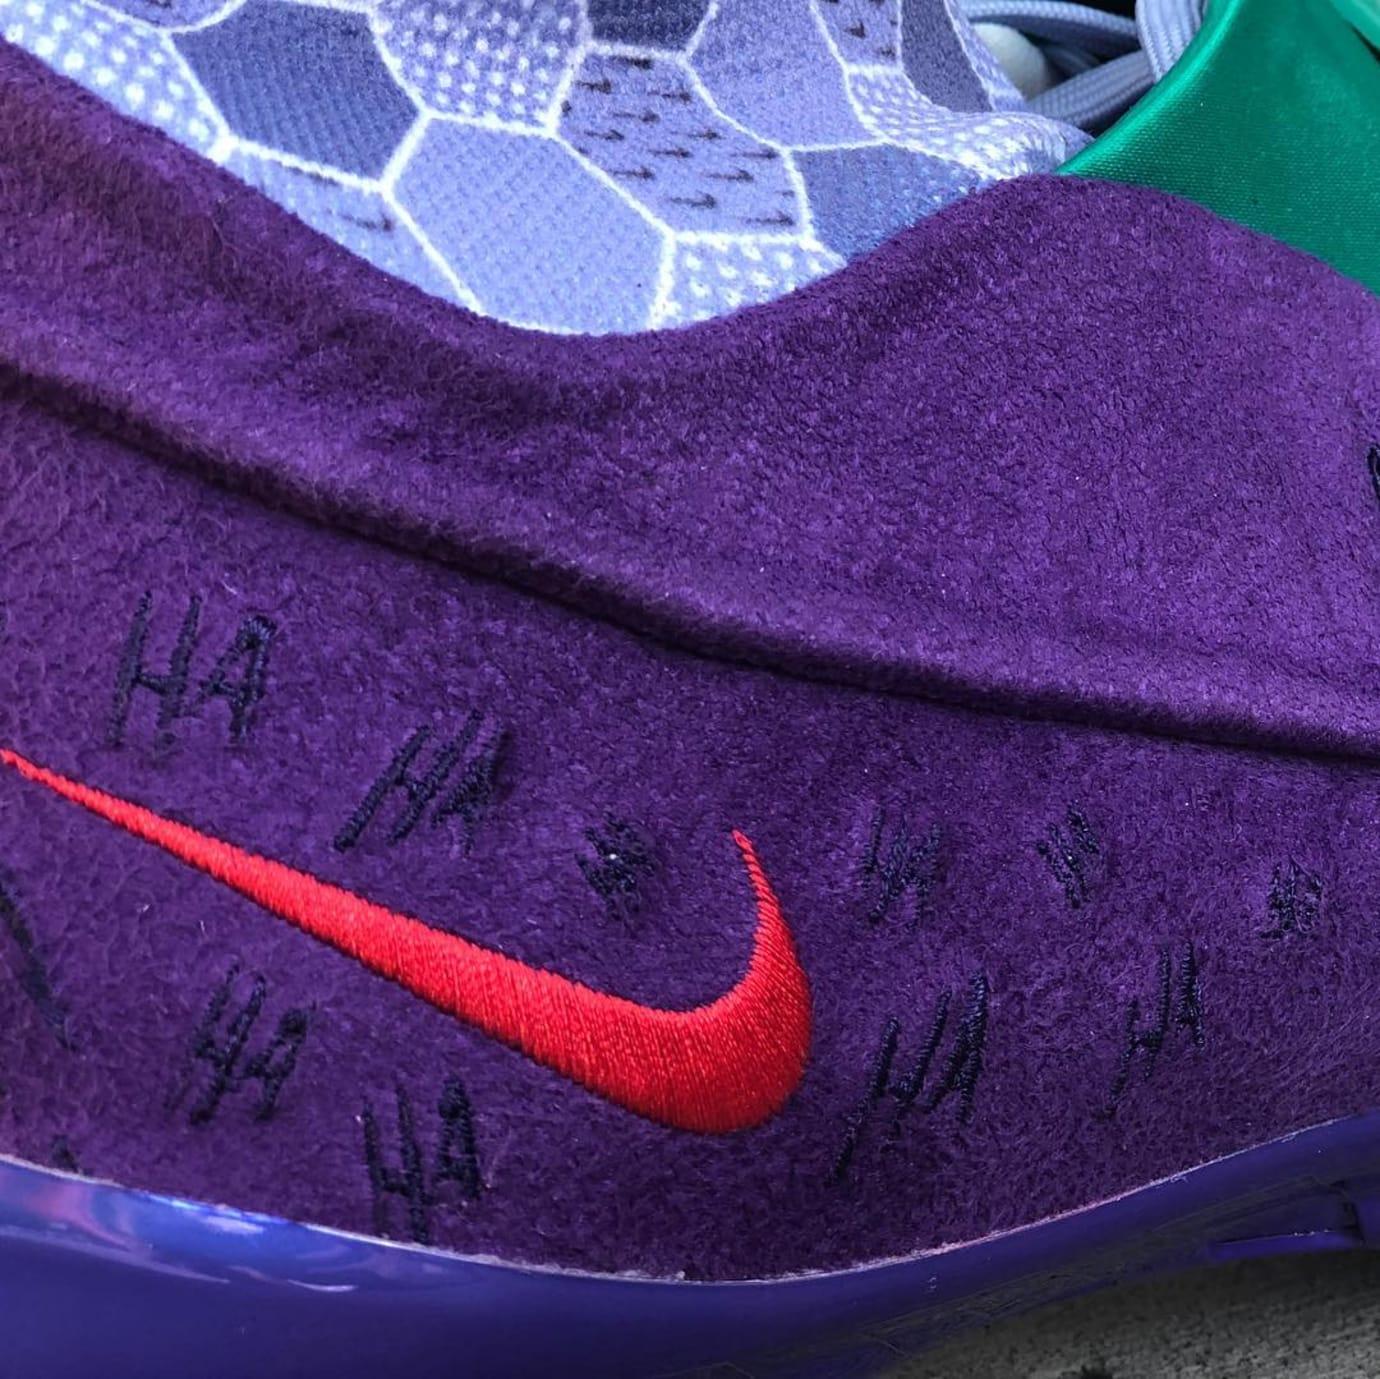 Image via Erin Cochrane · Odell Beckham Jr. Nike  Joker  Cleats 5 ddc5d399b